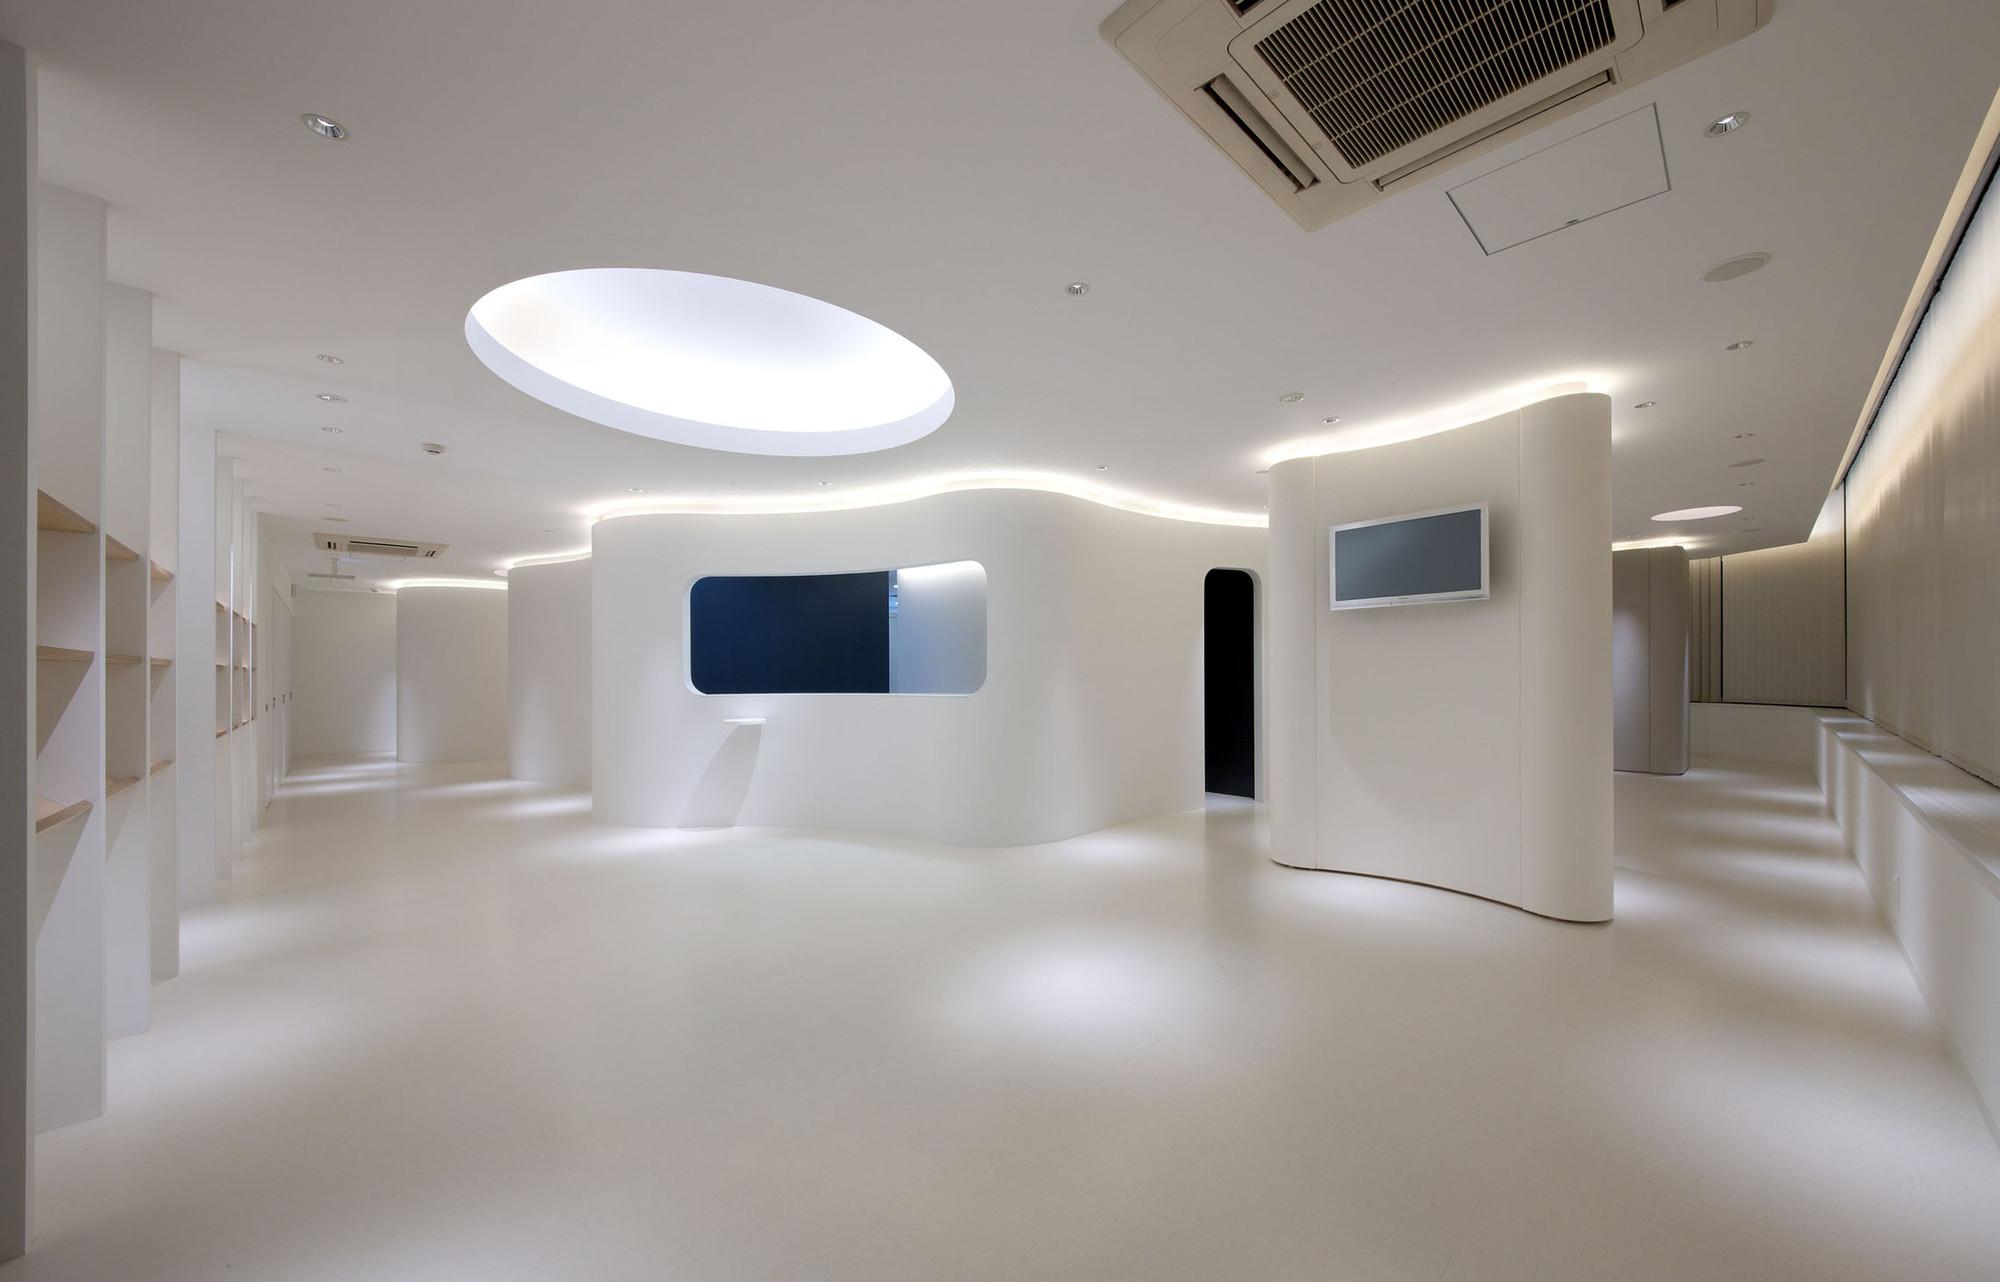 Galera De Clnica Dermatolgica Hommachi Atelier Kuu 2 Interiors Inside Ideas Interiors design about Everything [magnanprojects.com]